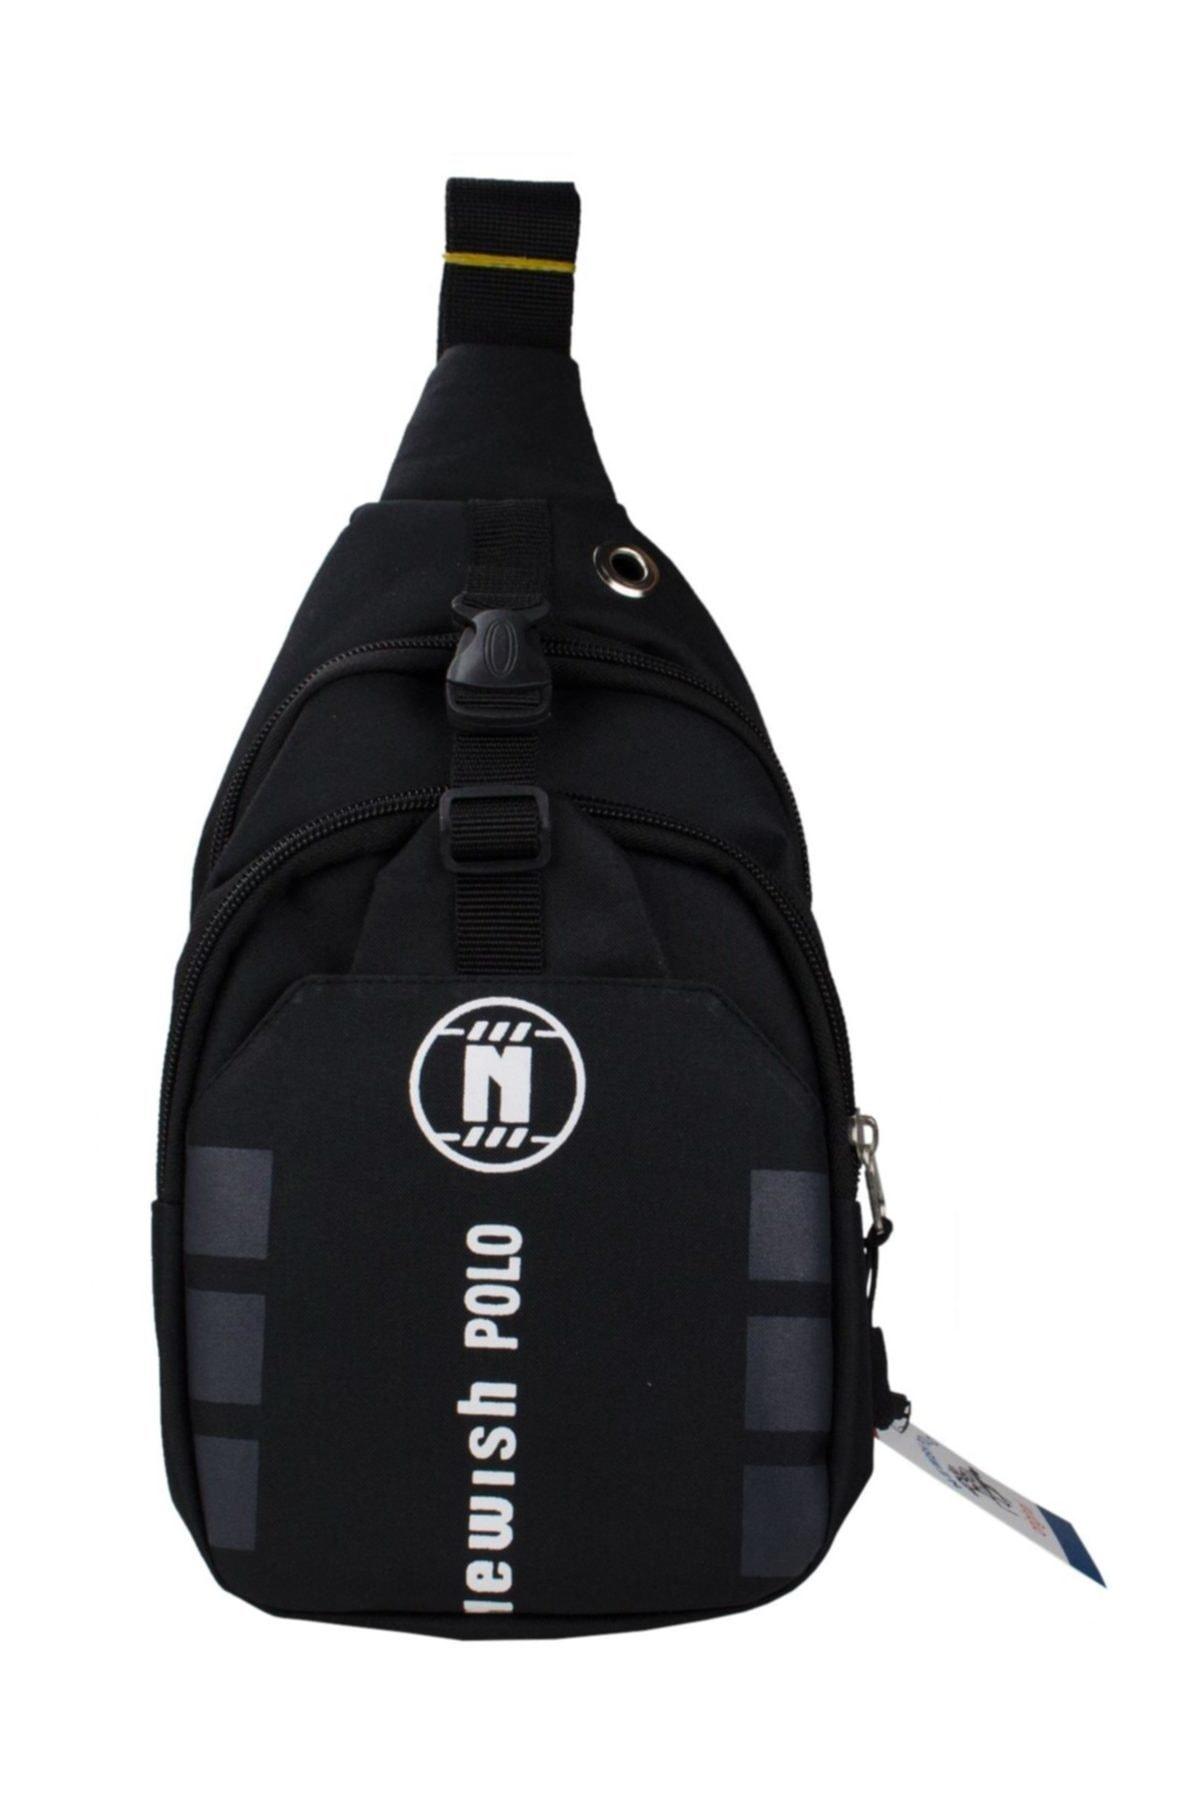 Newish Polo Body Bag Çapraz Çanta Waterproof